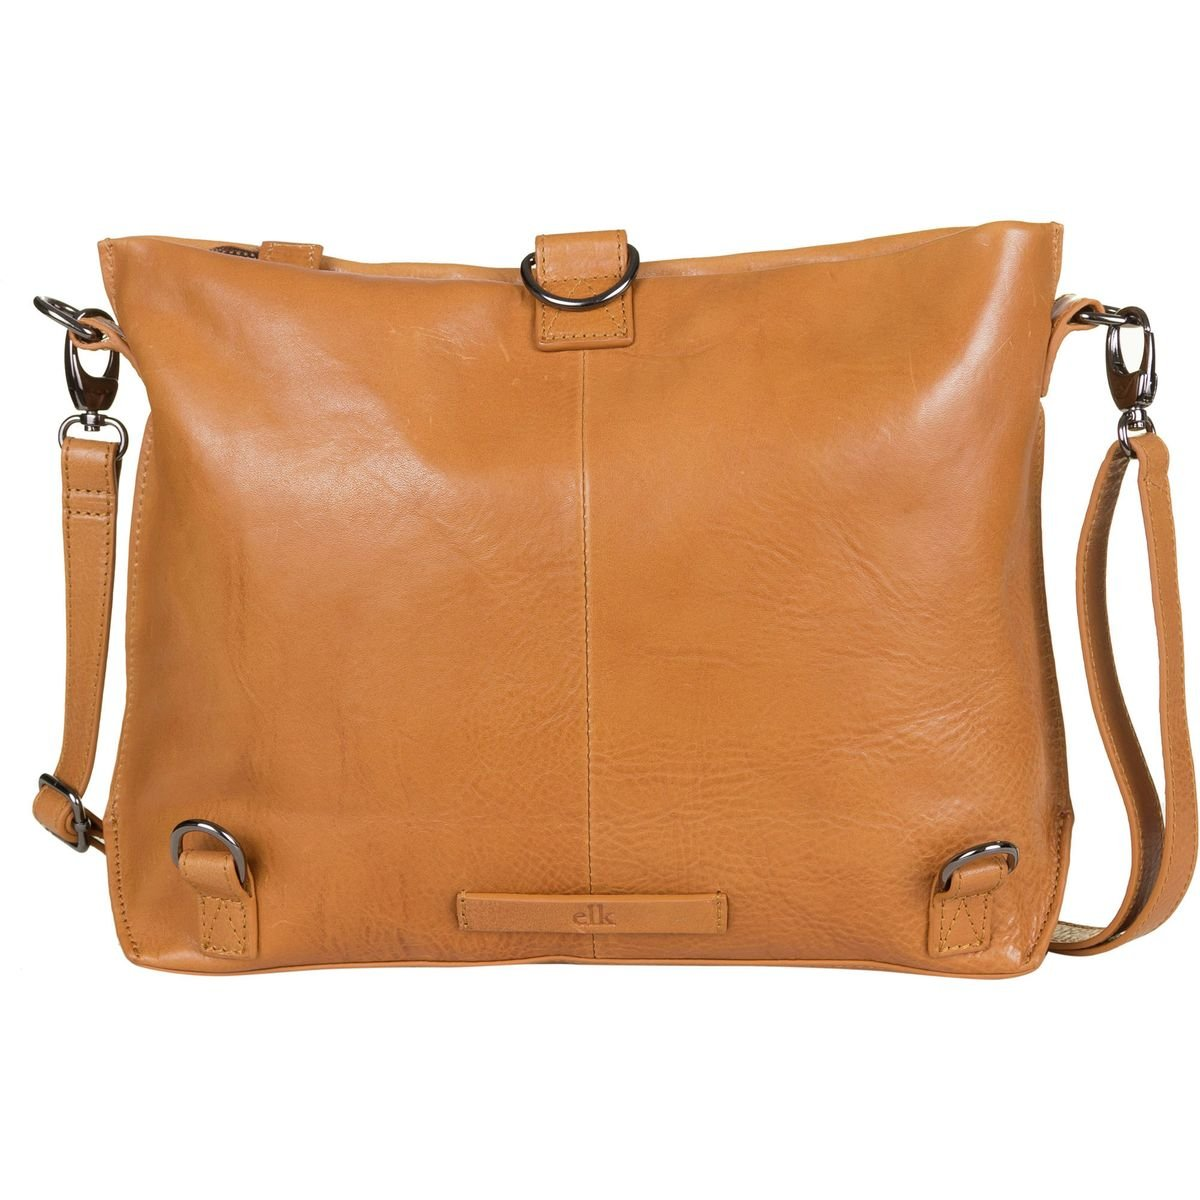 Elk Accessories Nuoli Mini Backpack - Women's Honey, One Size